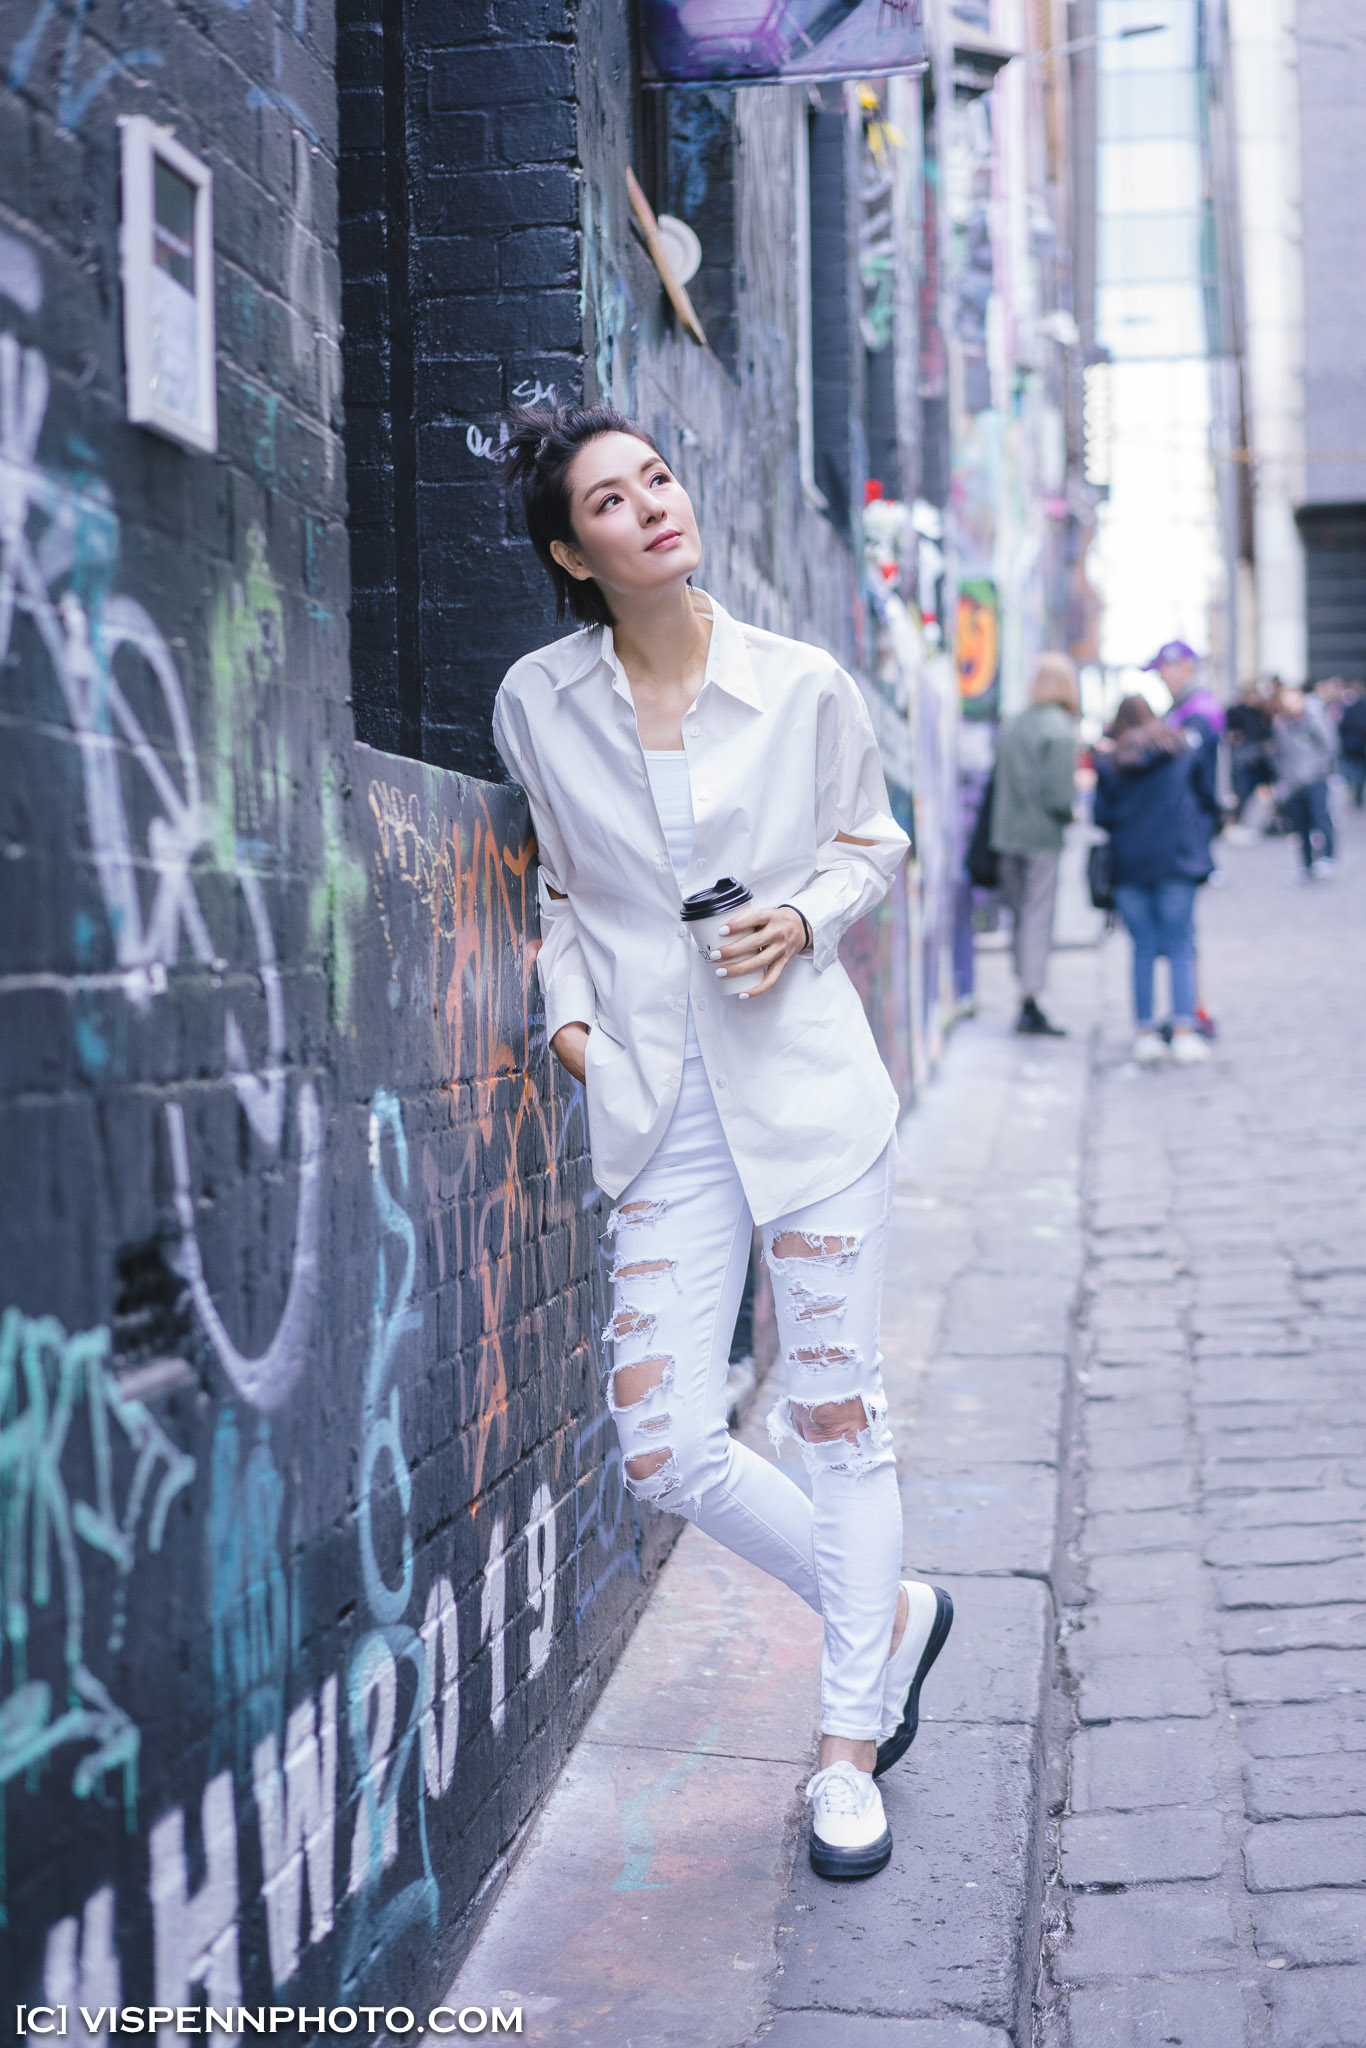 Melbourne Fashion Portrait Commercial Photography VISPENN 墨尔本 服装 商业 人像 摄影 MFW2A 3H 03425 A7R3 VISPENN